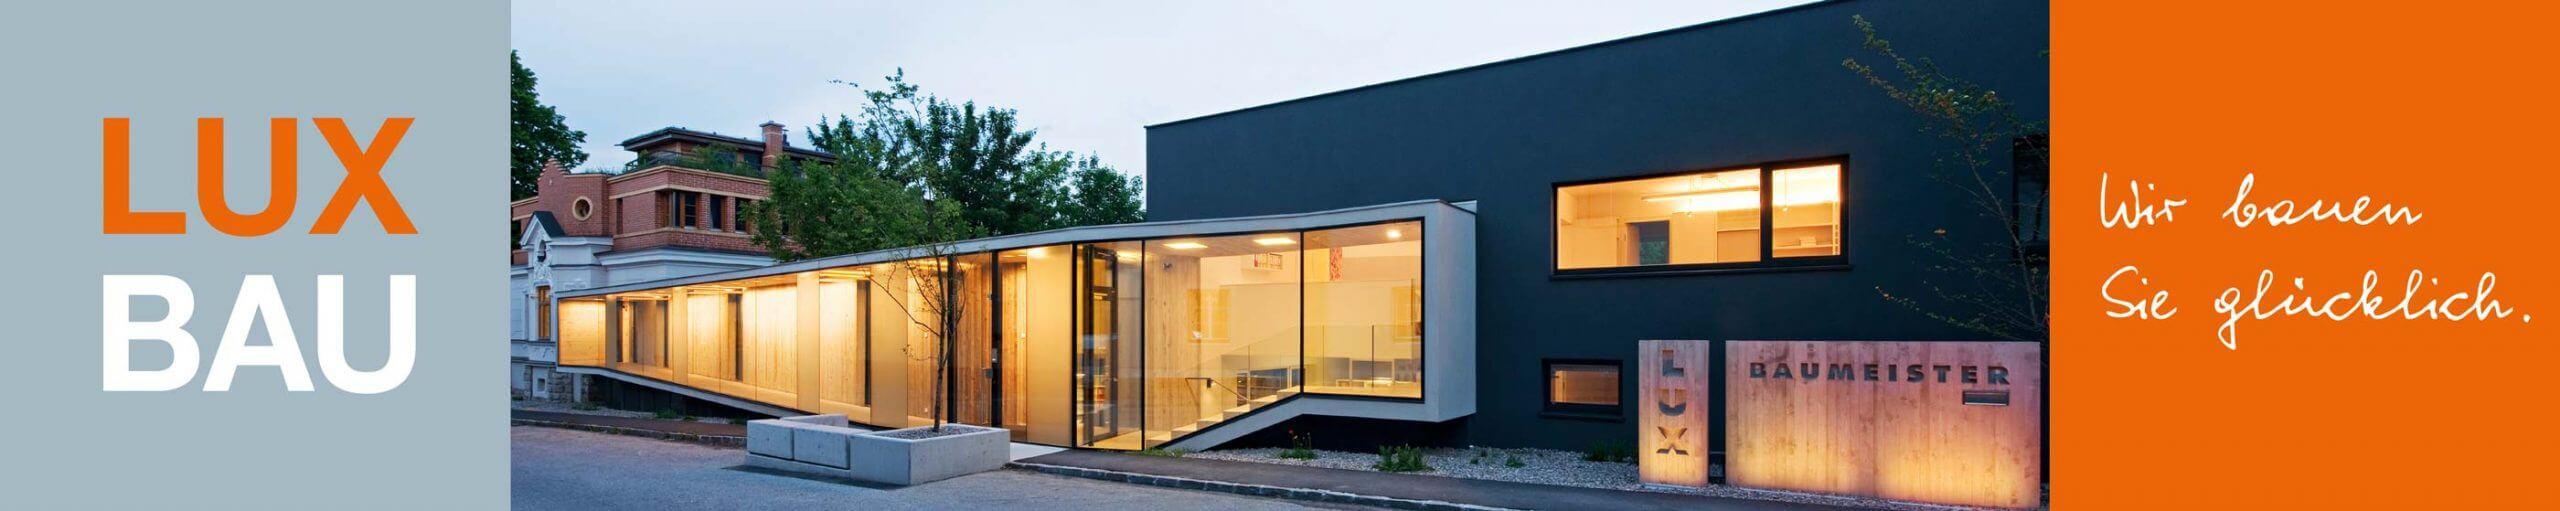 Lux Bau Zentrale Hainfeld